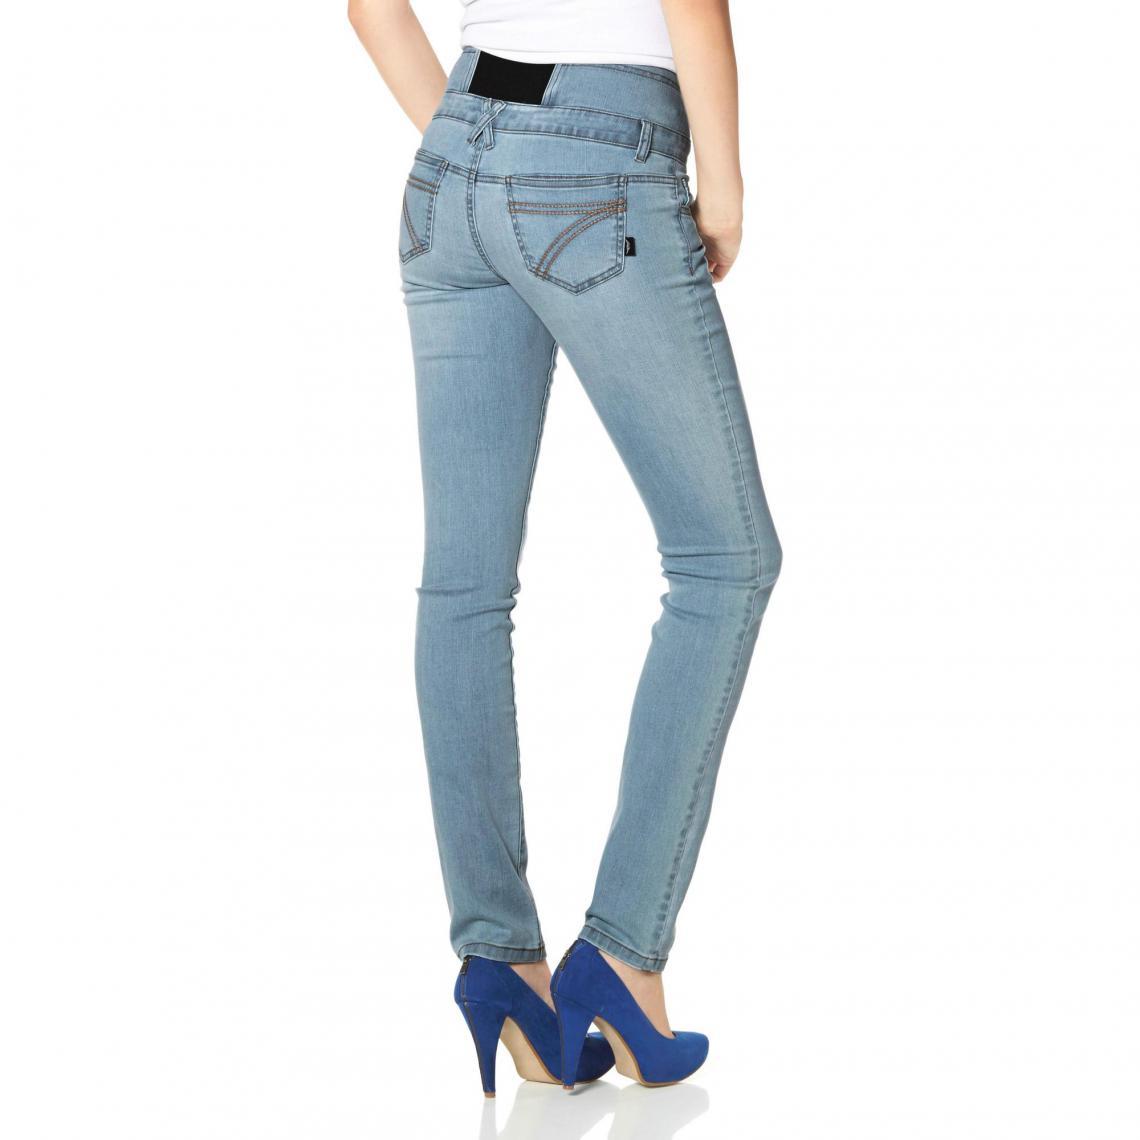 9817312c816b Jeans slim femme Arizona Cliquez l image pour l agrandir. Jean slim taille  haute Arizona - Bleu Arizona